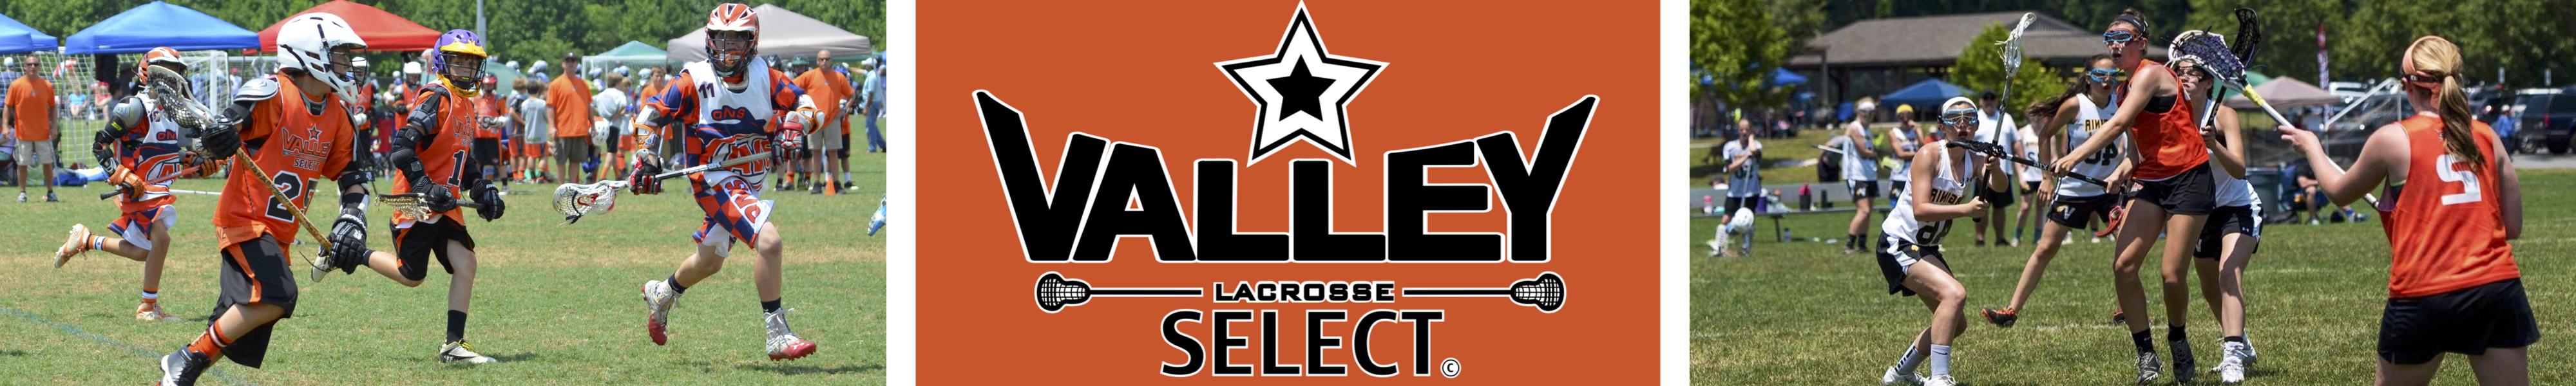 Valley Select, Lacrosse, Goal, Field